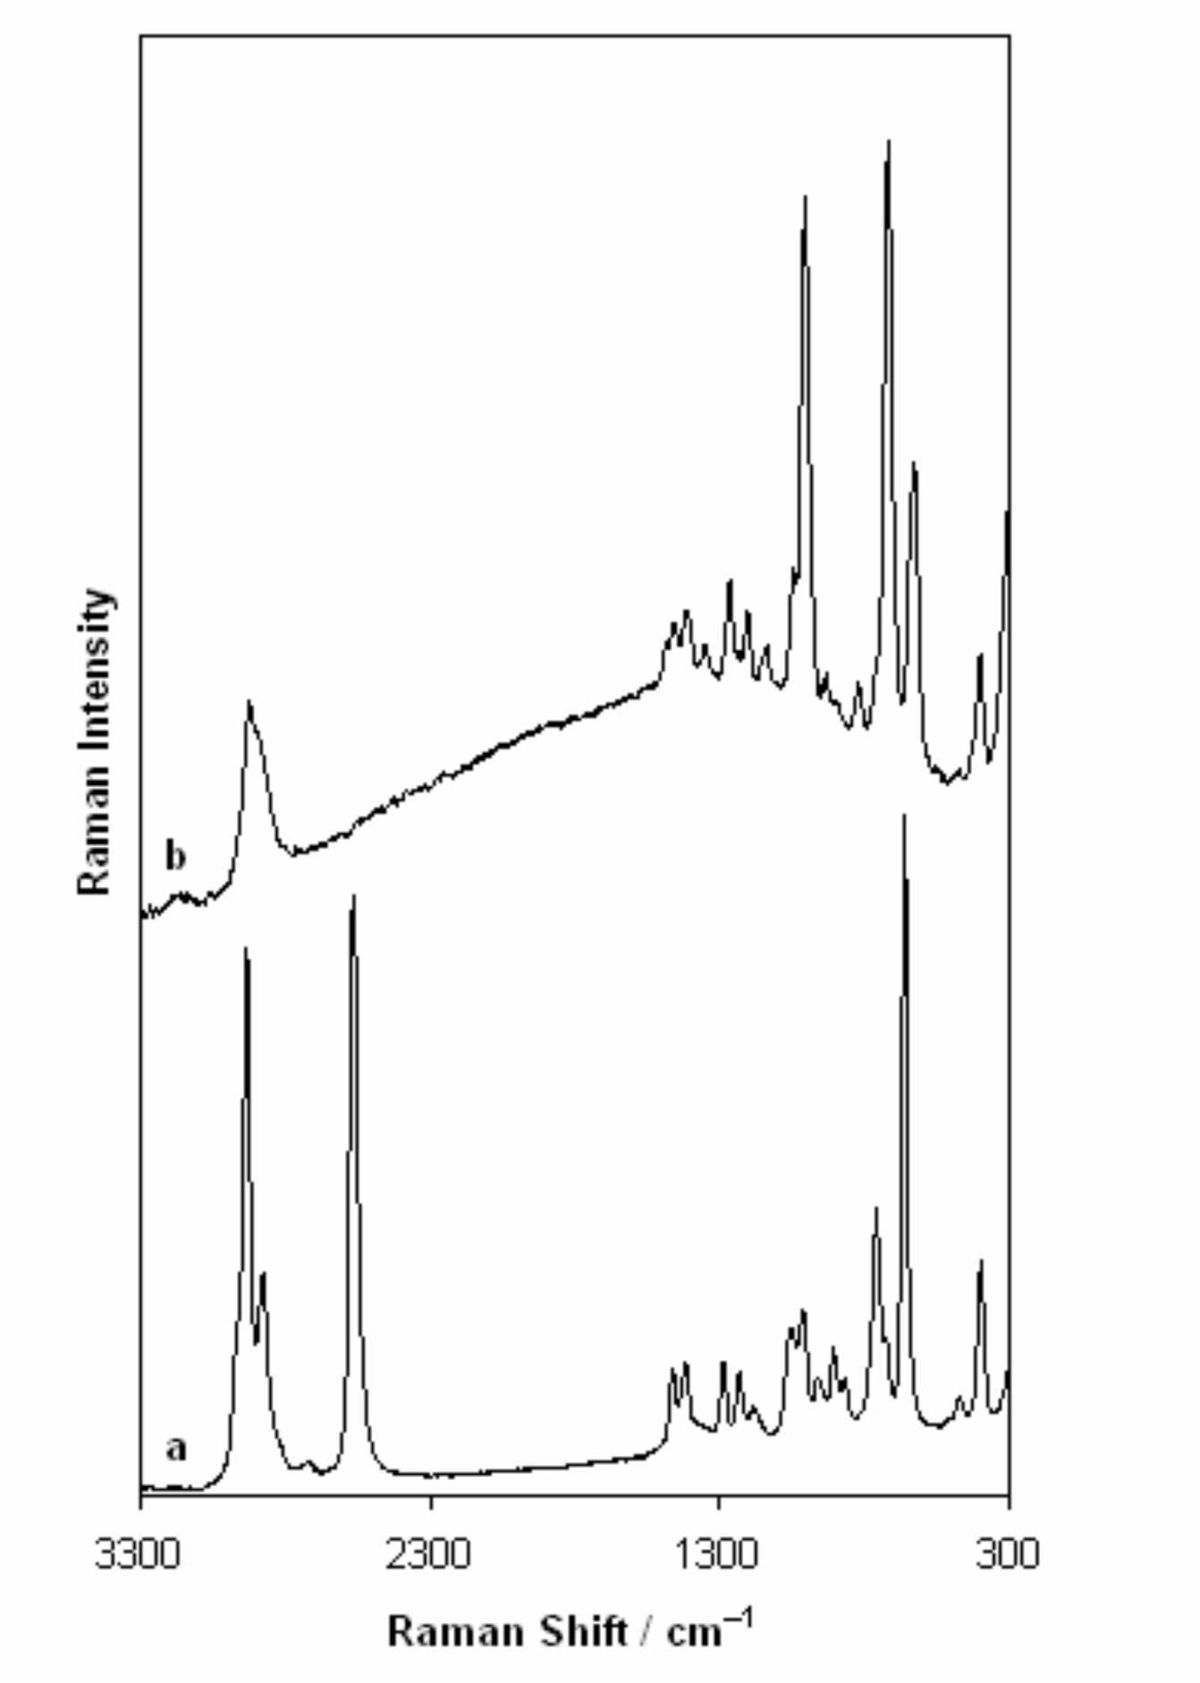 hight resolution of wiring diagram 2003 kium spectra g